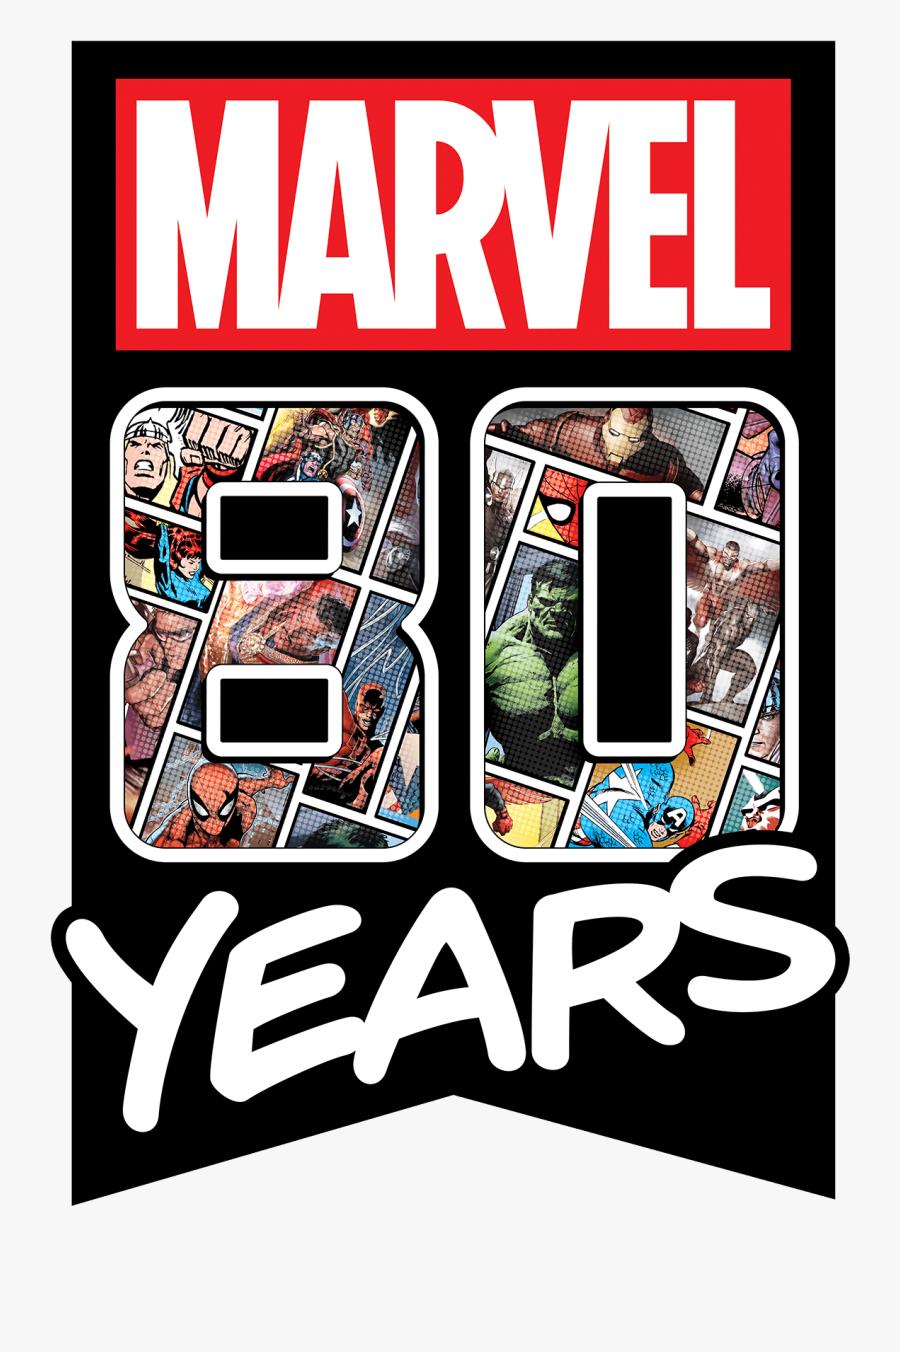 Marvel Heroes 2015, Transparent Clipart